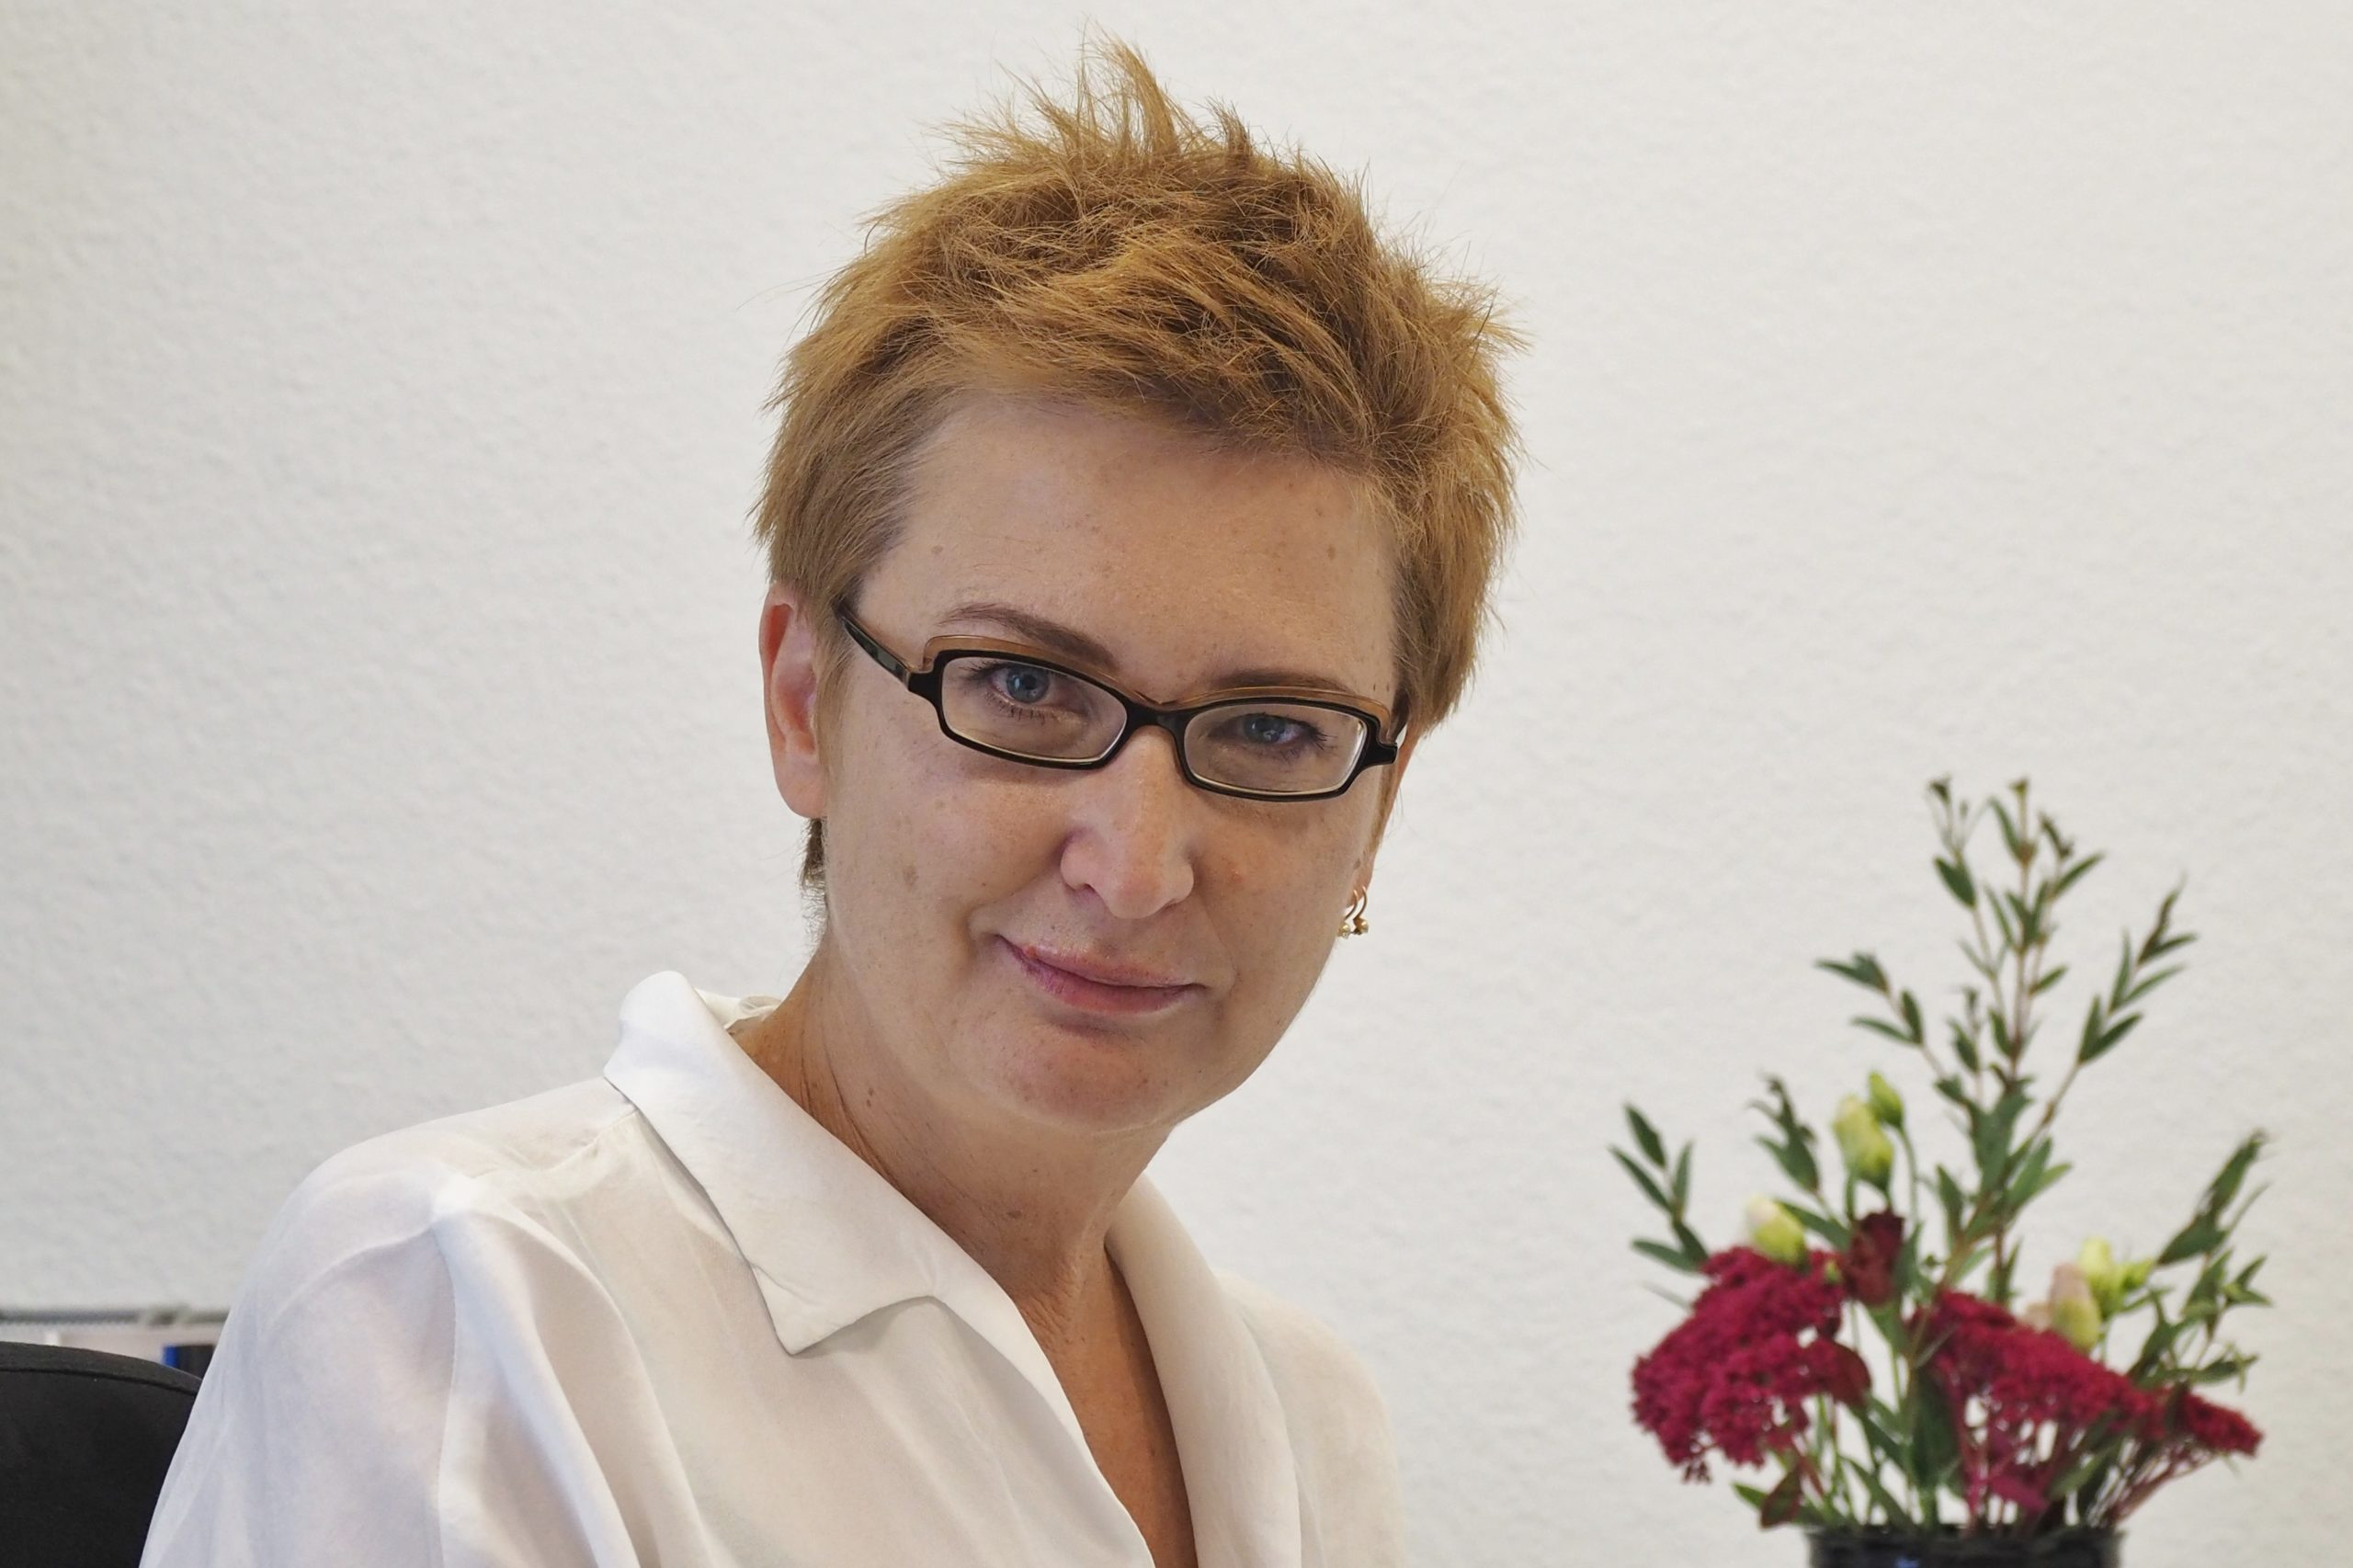 Frau Dipl-Med. A. Neuhausen-Abramkina